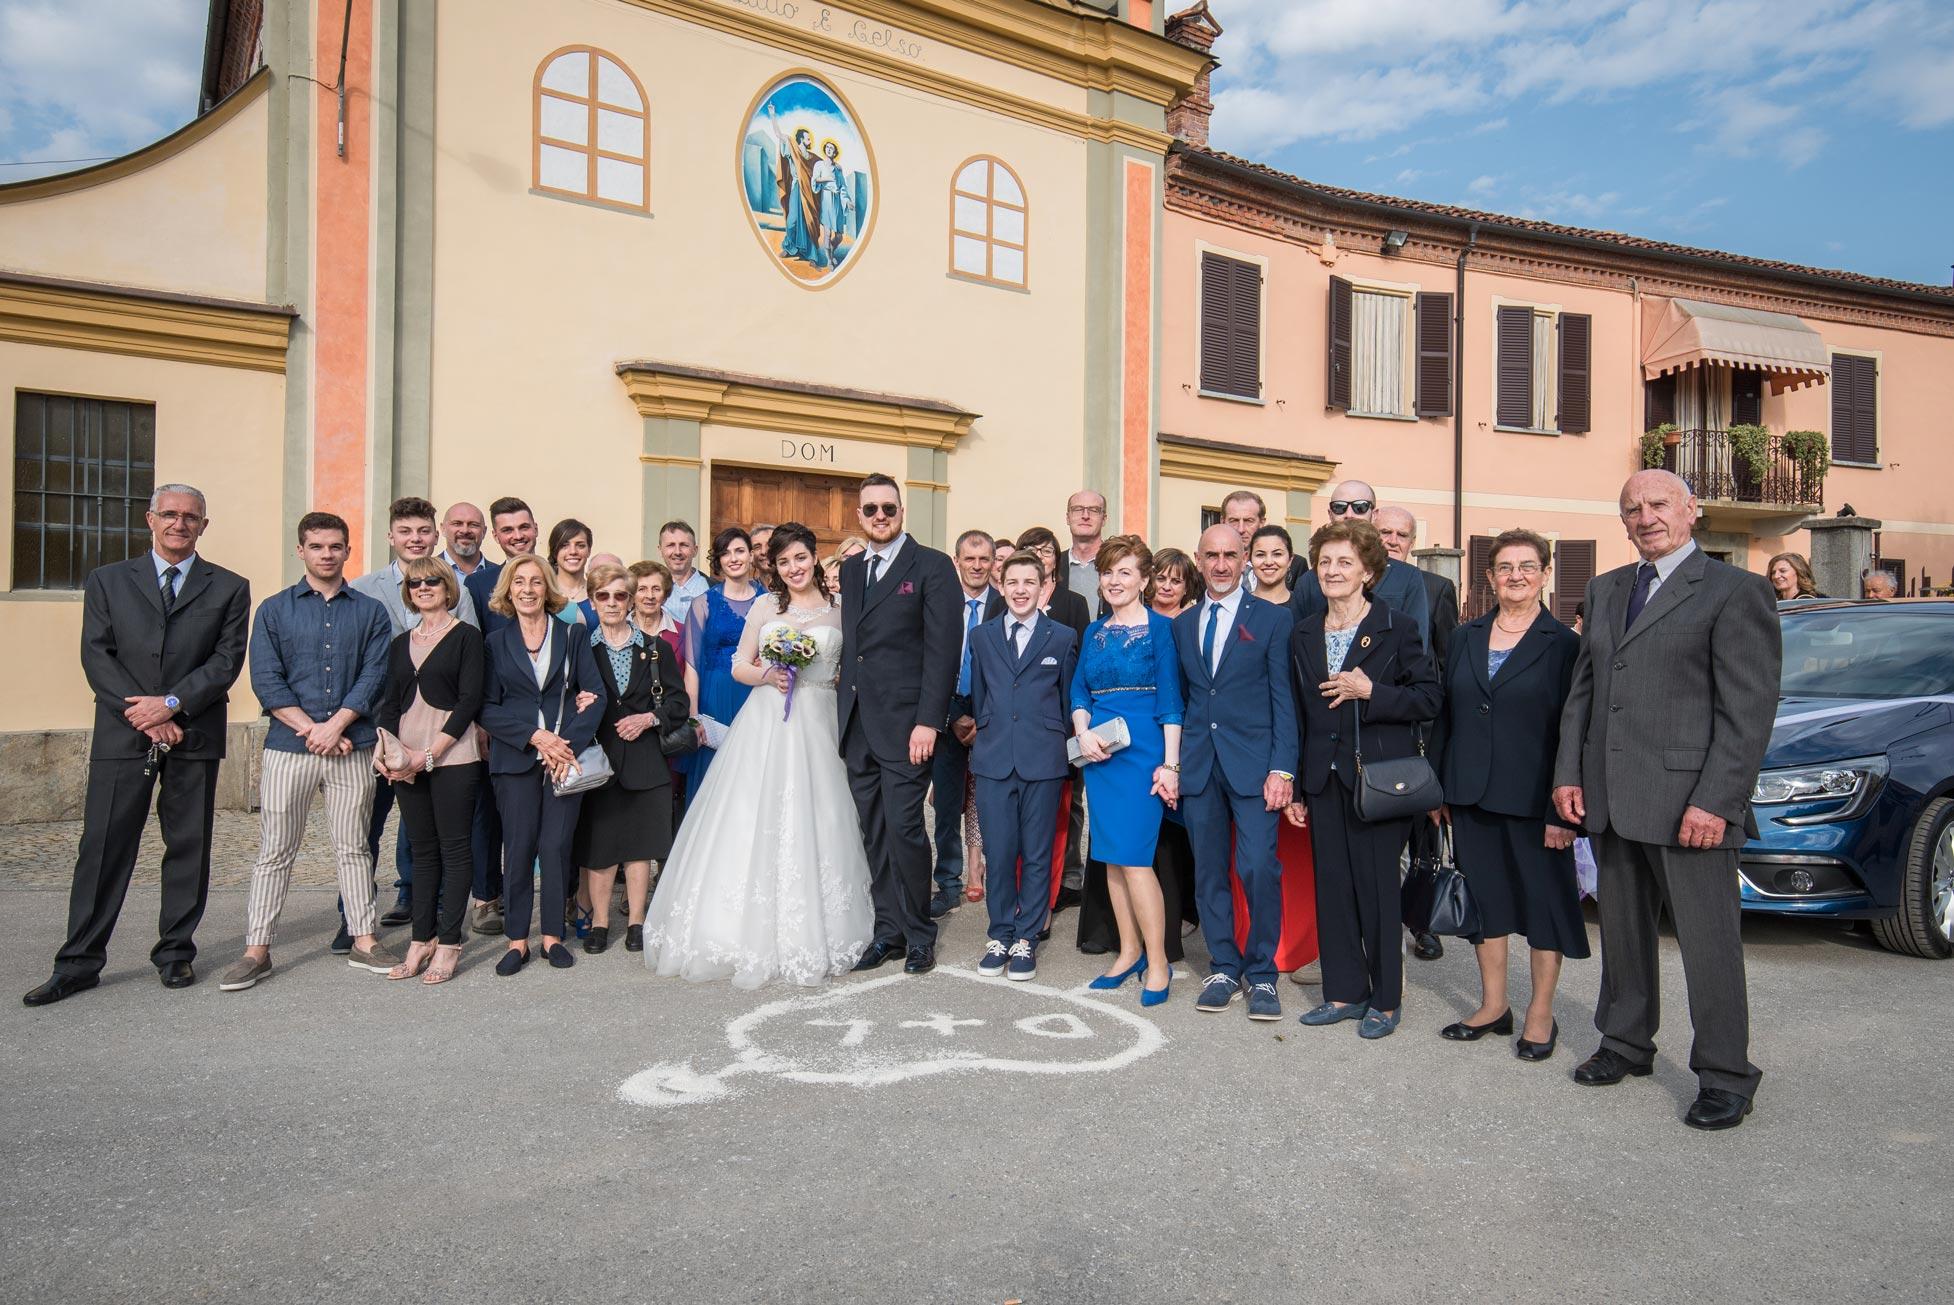 Matrimonio a Narzole Lorenza Diego - DSC 0632 - Fotografie matrimonio con parenti - Fotografie matrimonio con parenti